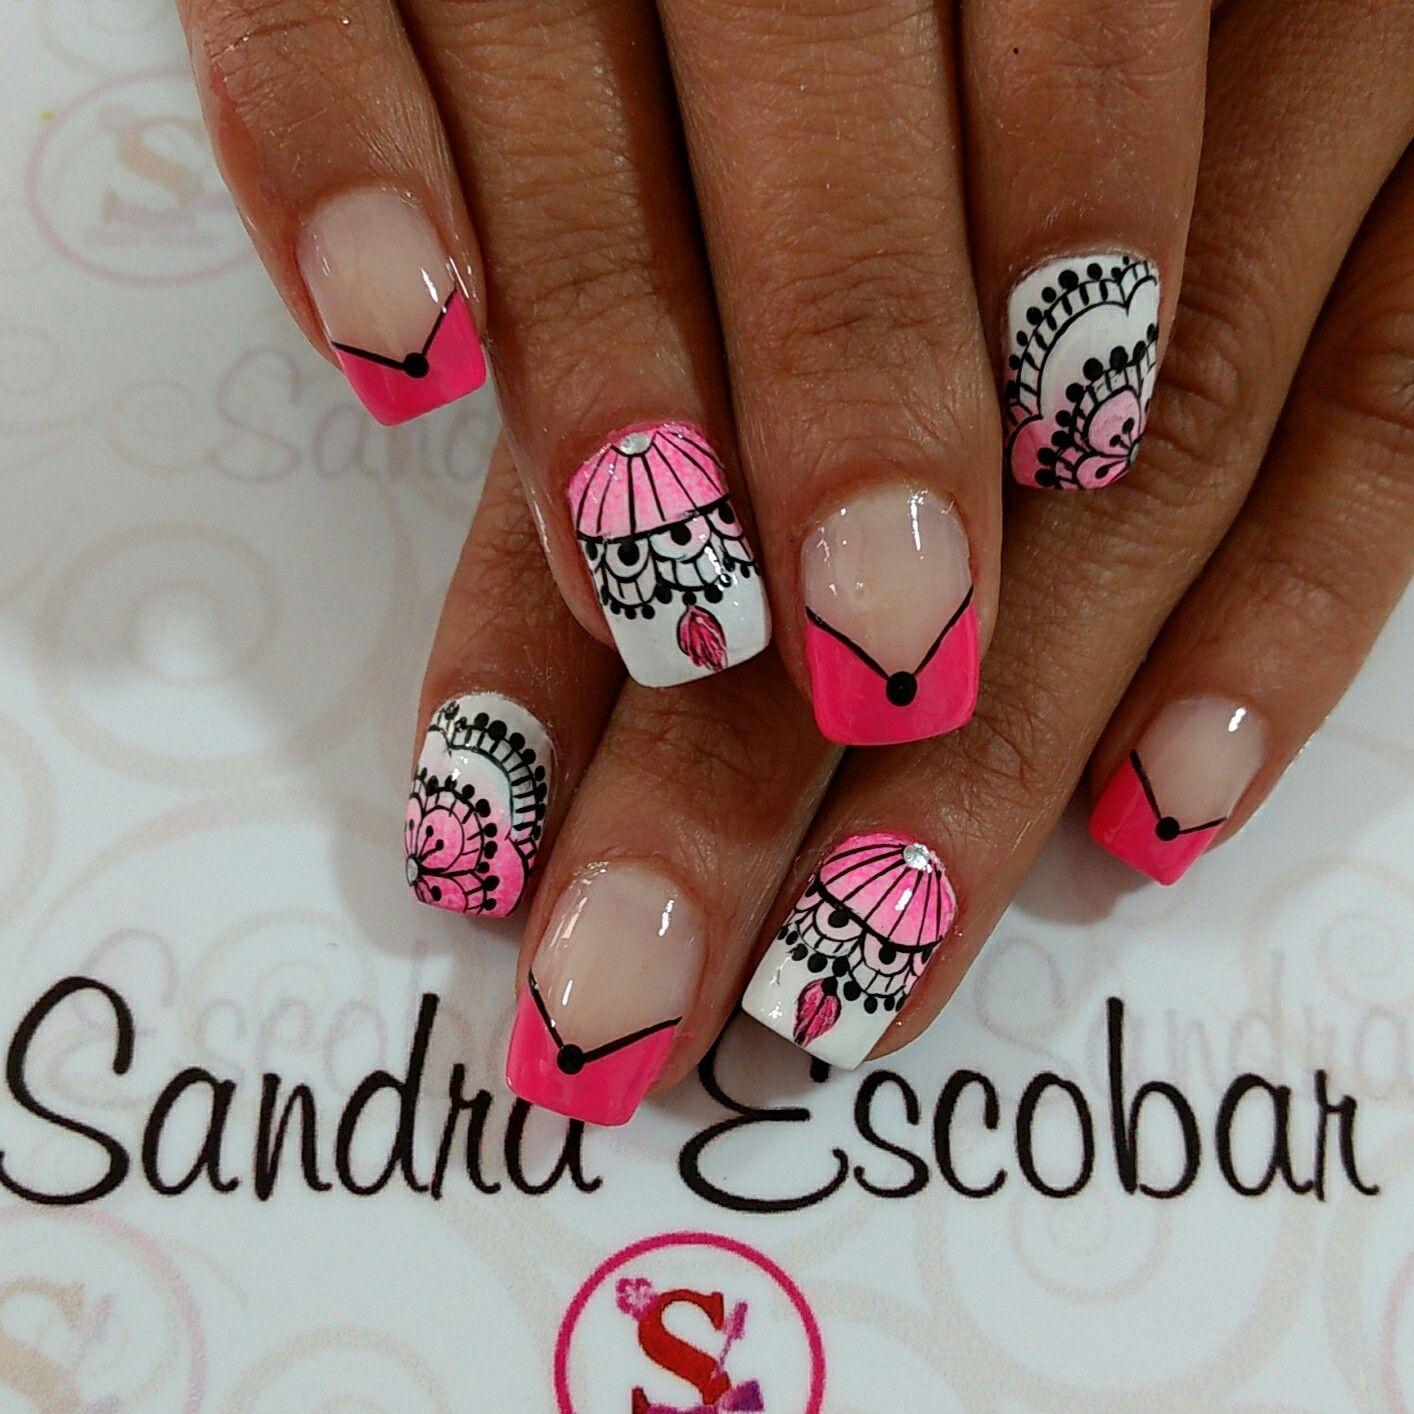 Pin de Sandra Escobar en uñas mandala | Pinterest | Diseños de uñas ...